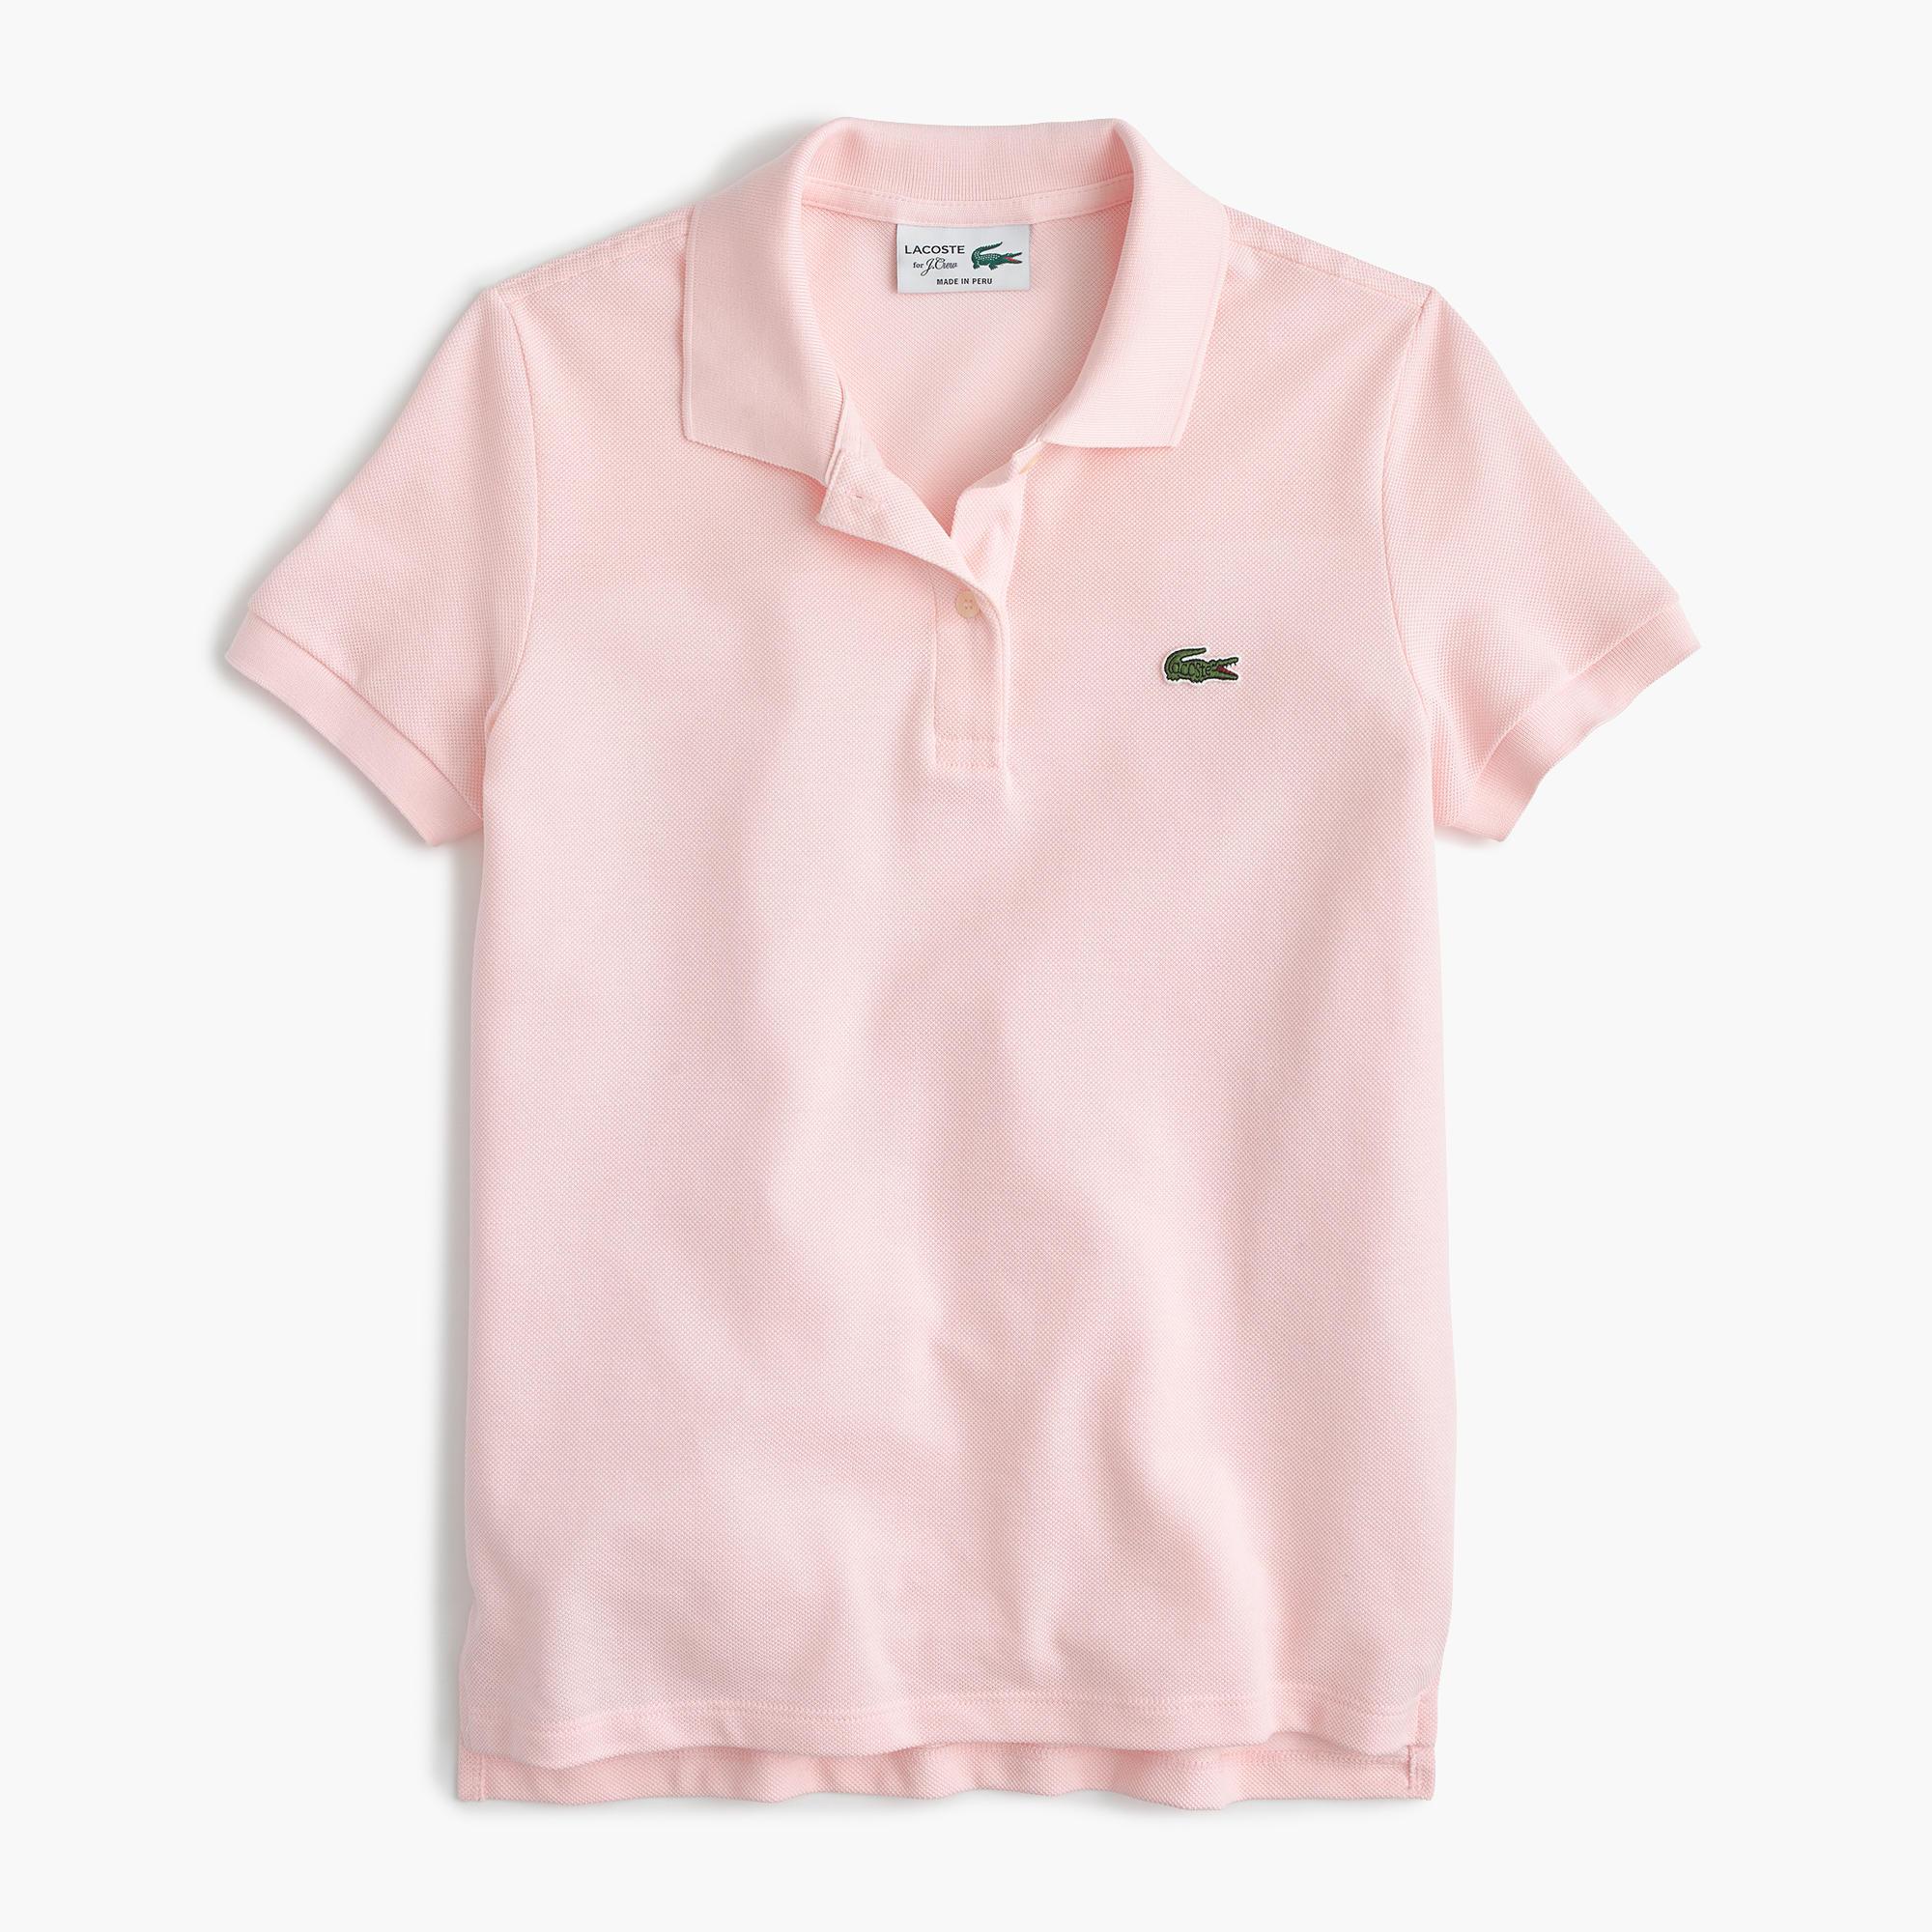 Lacoste For J Crew Polo Shirt Women 39 S Polo Shirts J Crew